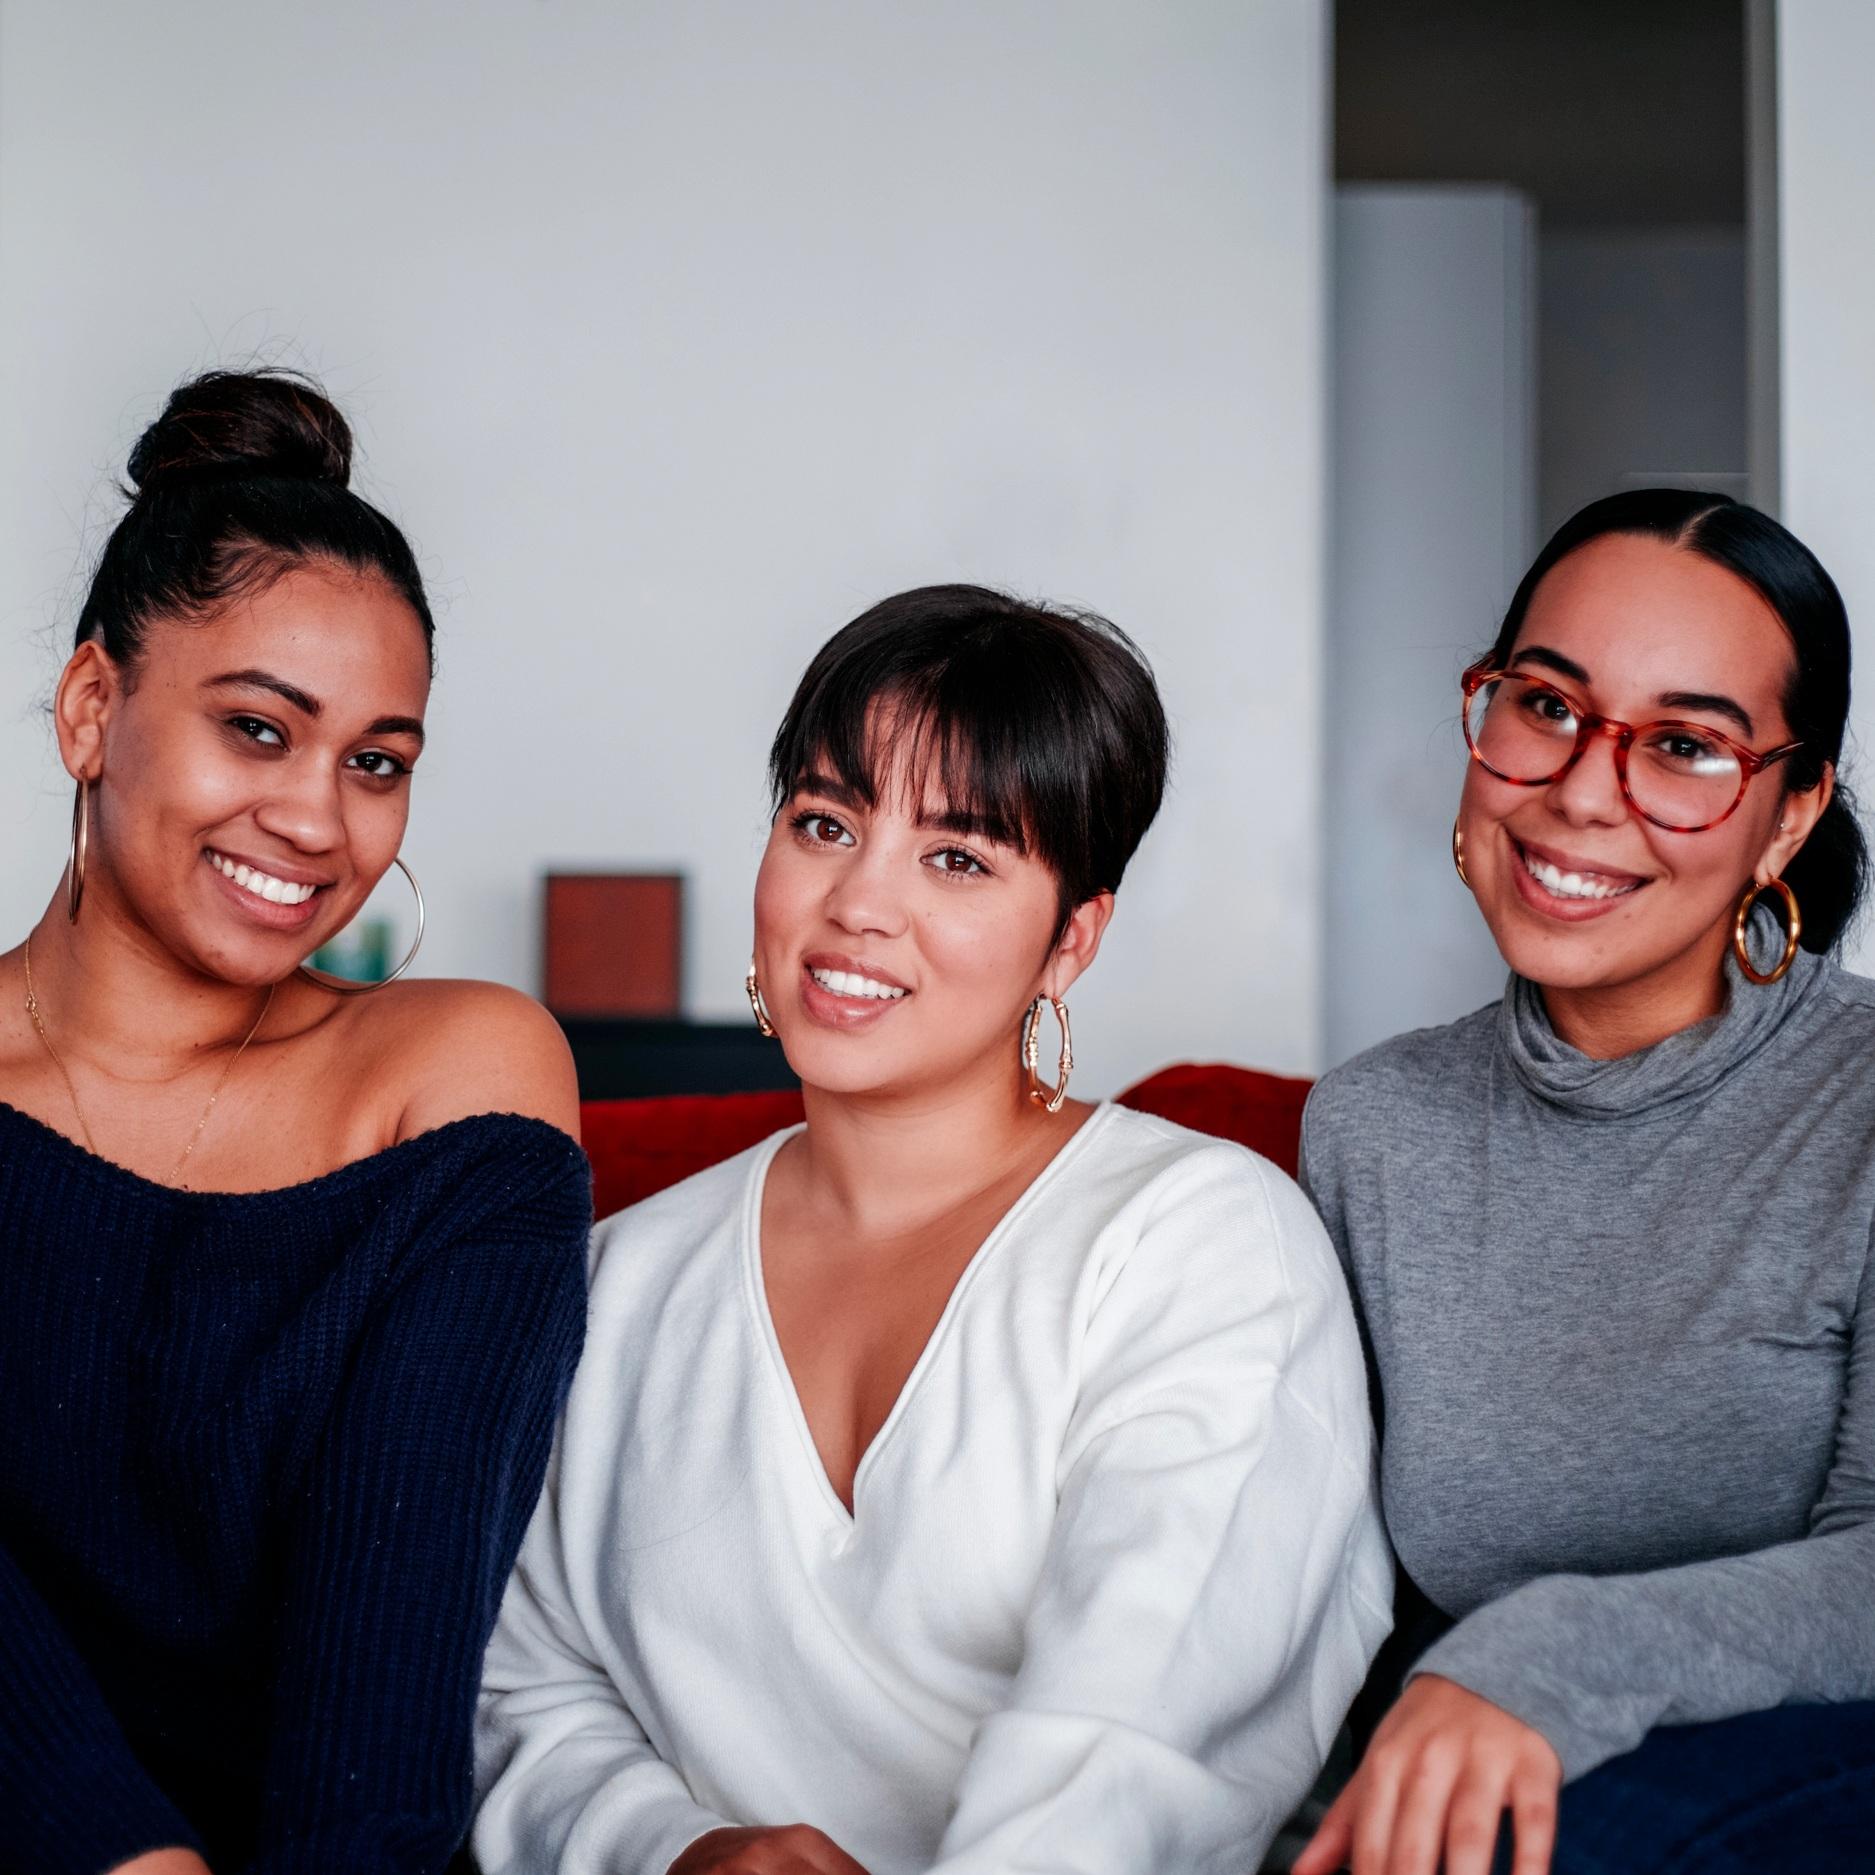 Interview: Entrepreneurship & Employment | Part II - HONEST WOMANHOOD